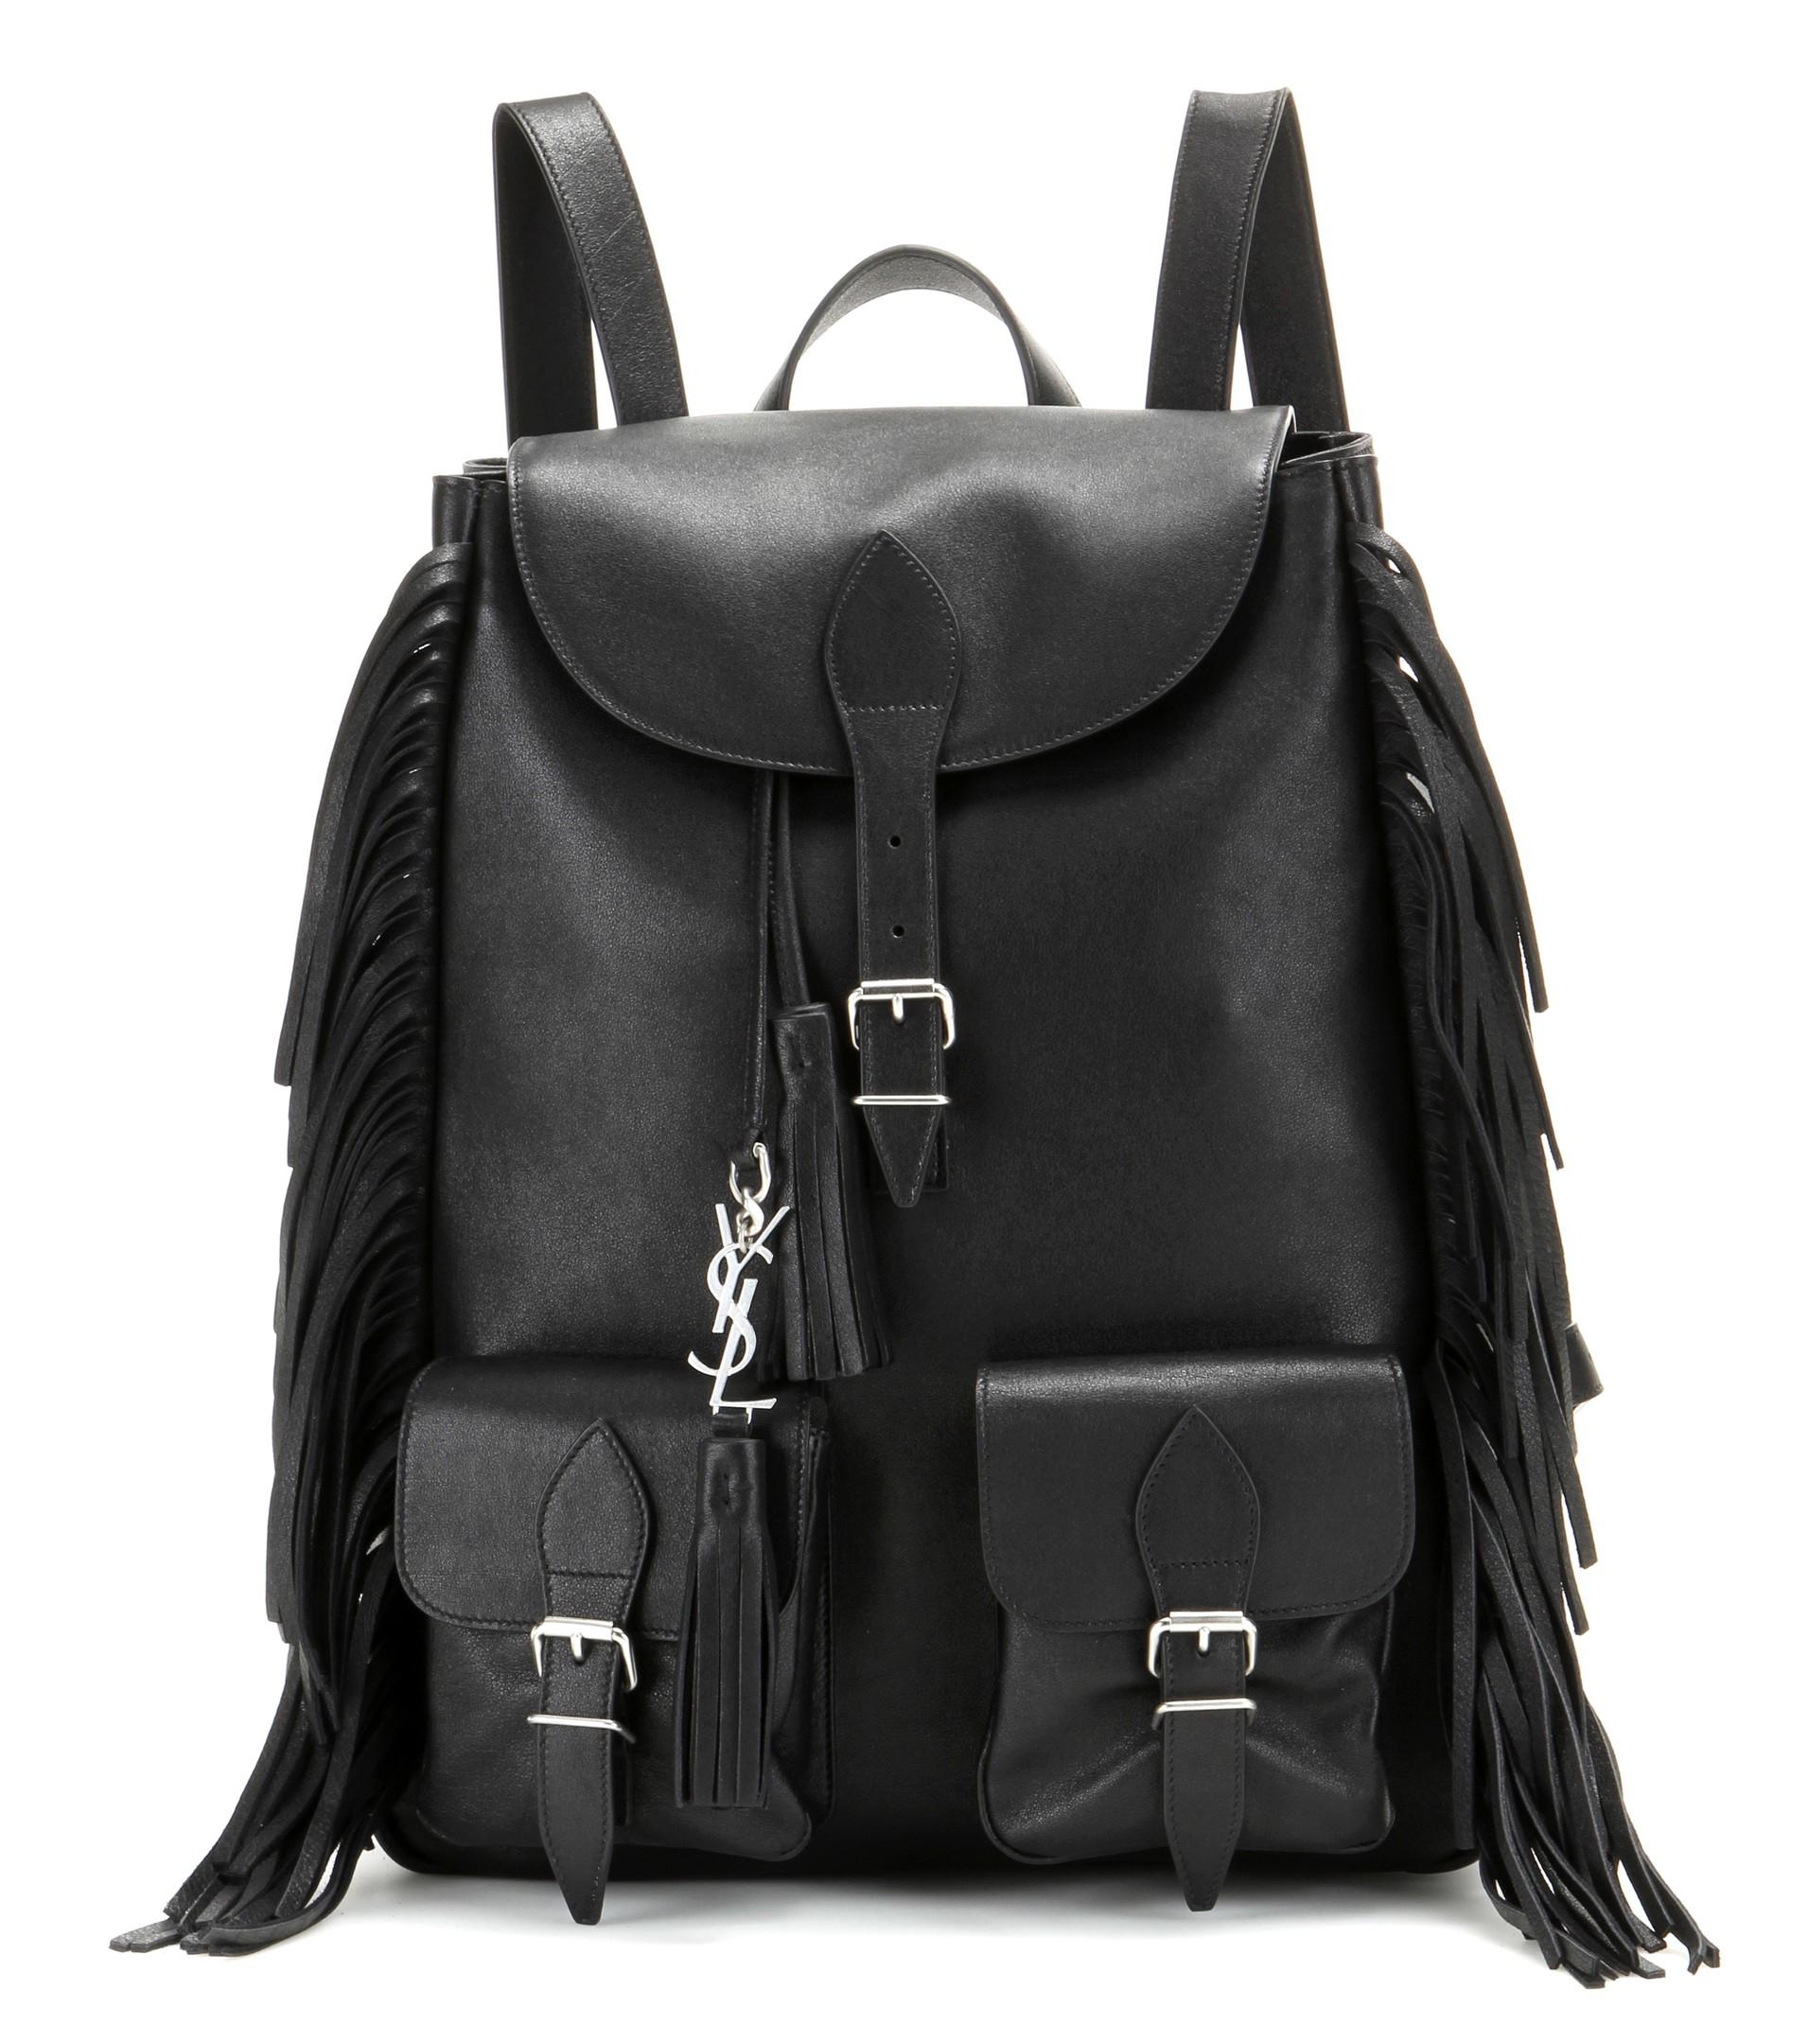 d1165ebb3b Lyst - Saint Laurent Fringed Leather Backpack in Black